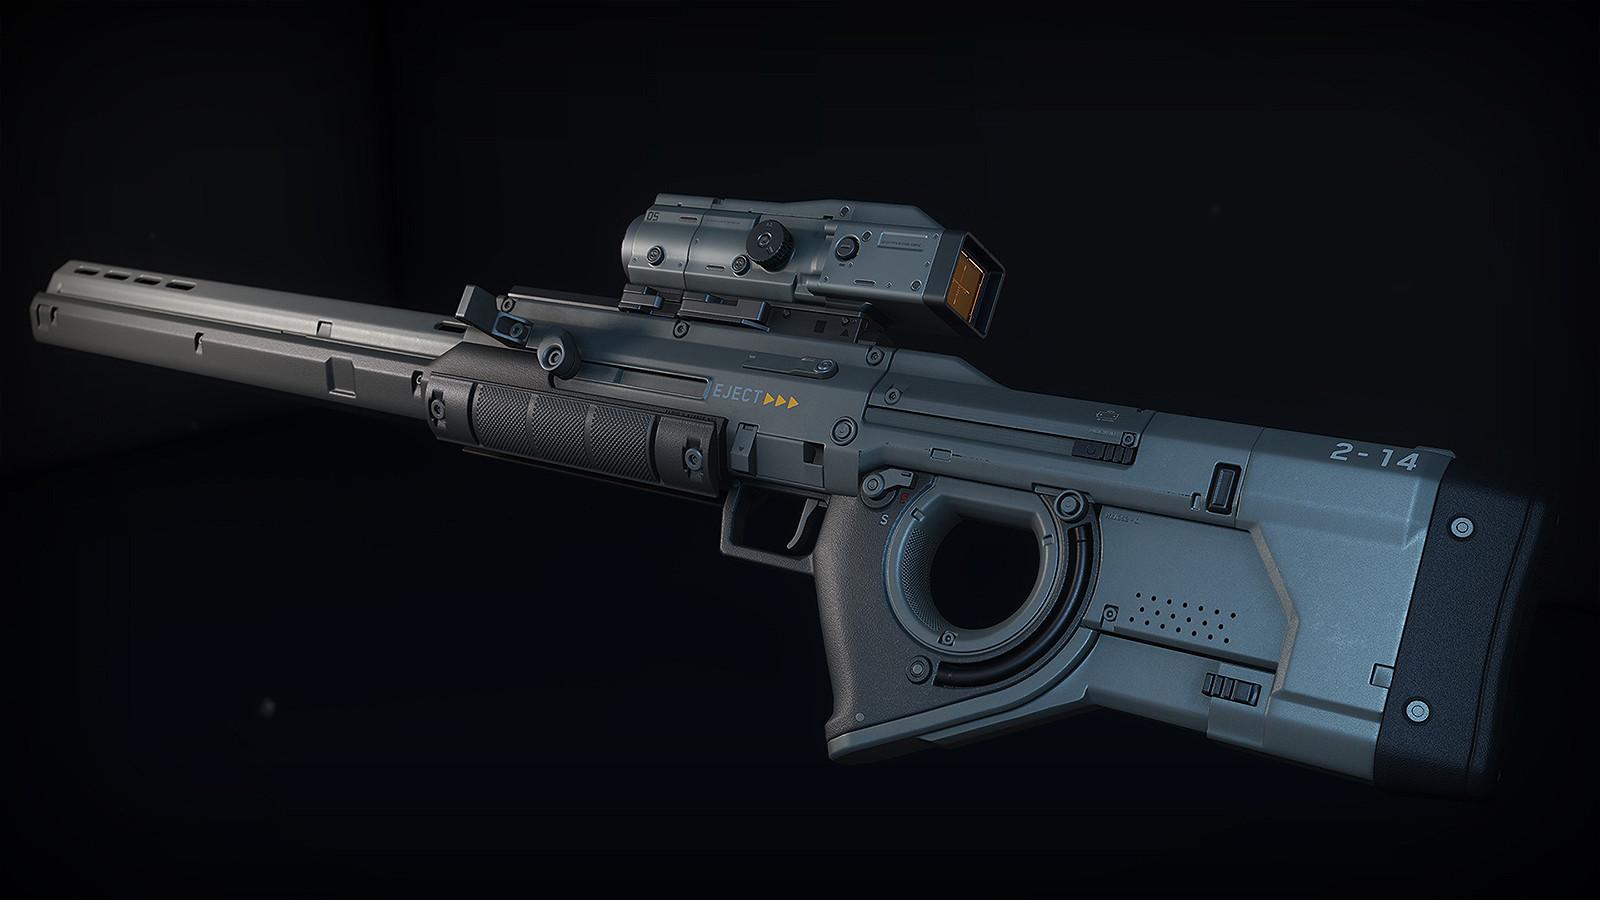 ze-ev-harris-kw-sniper-rifle-ingame-clea